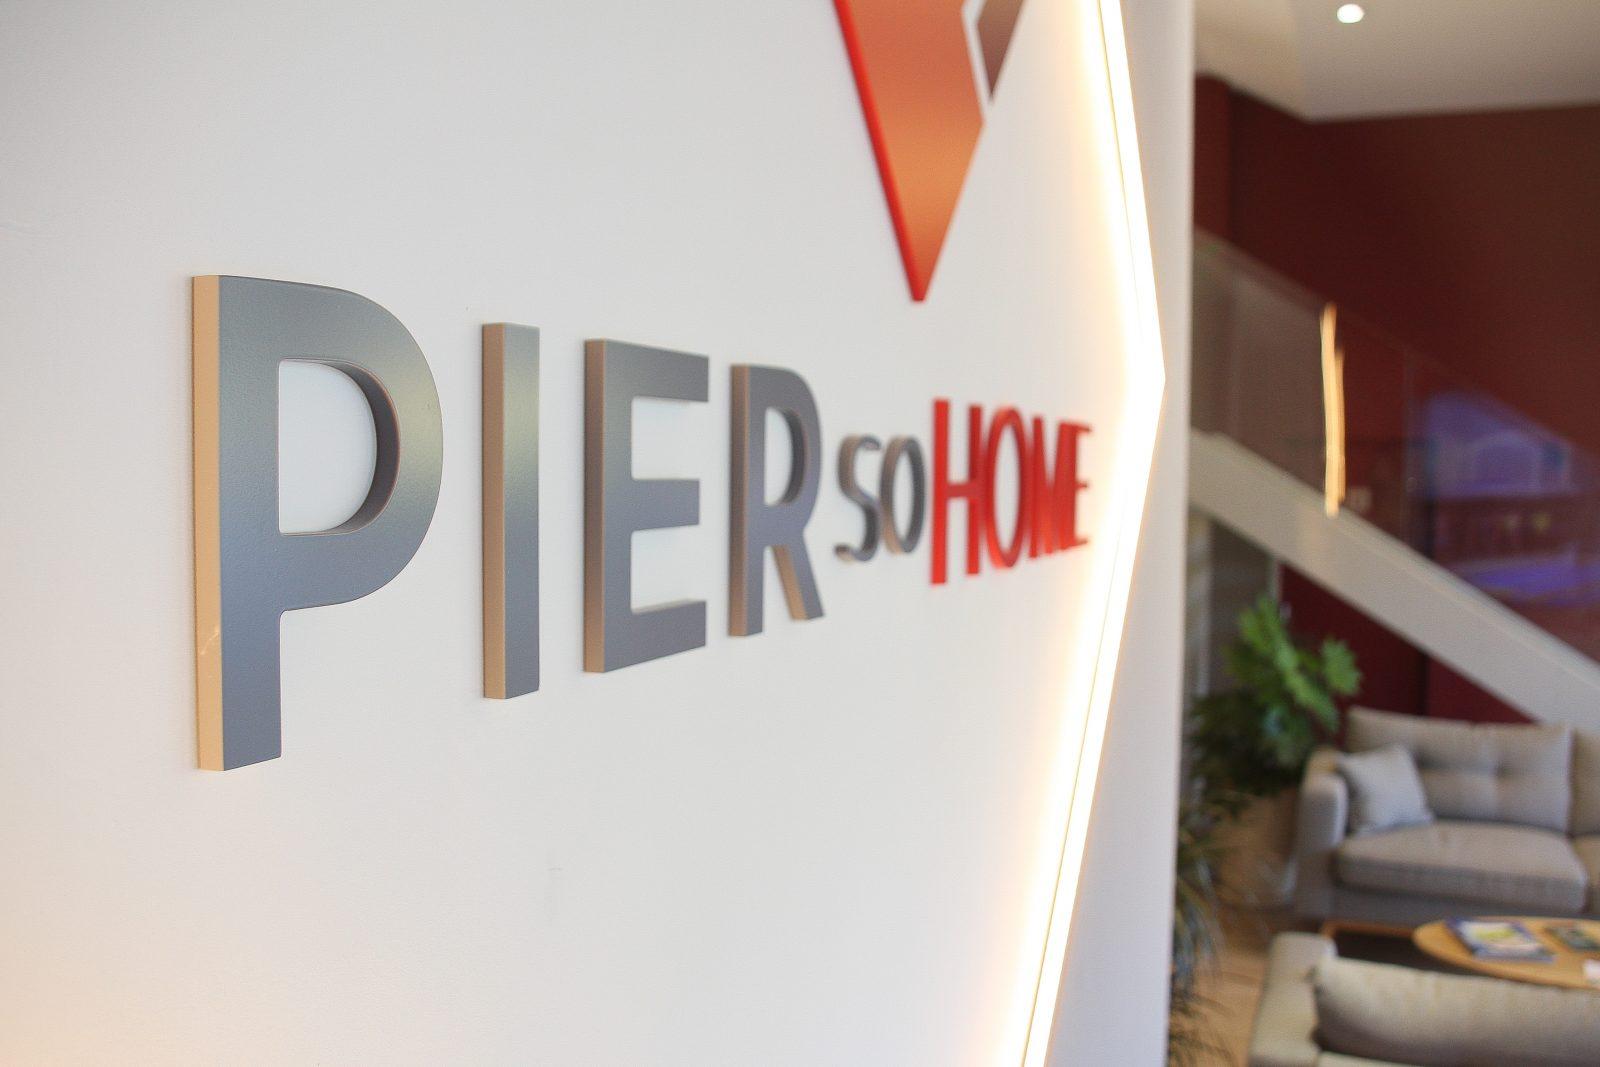 Agence PierSoHome